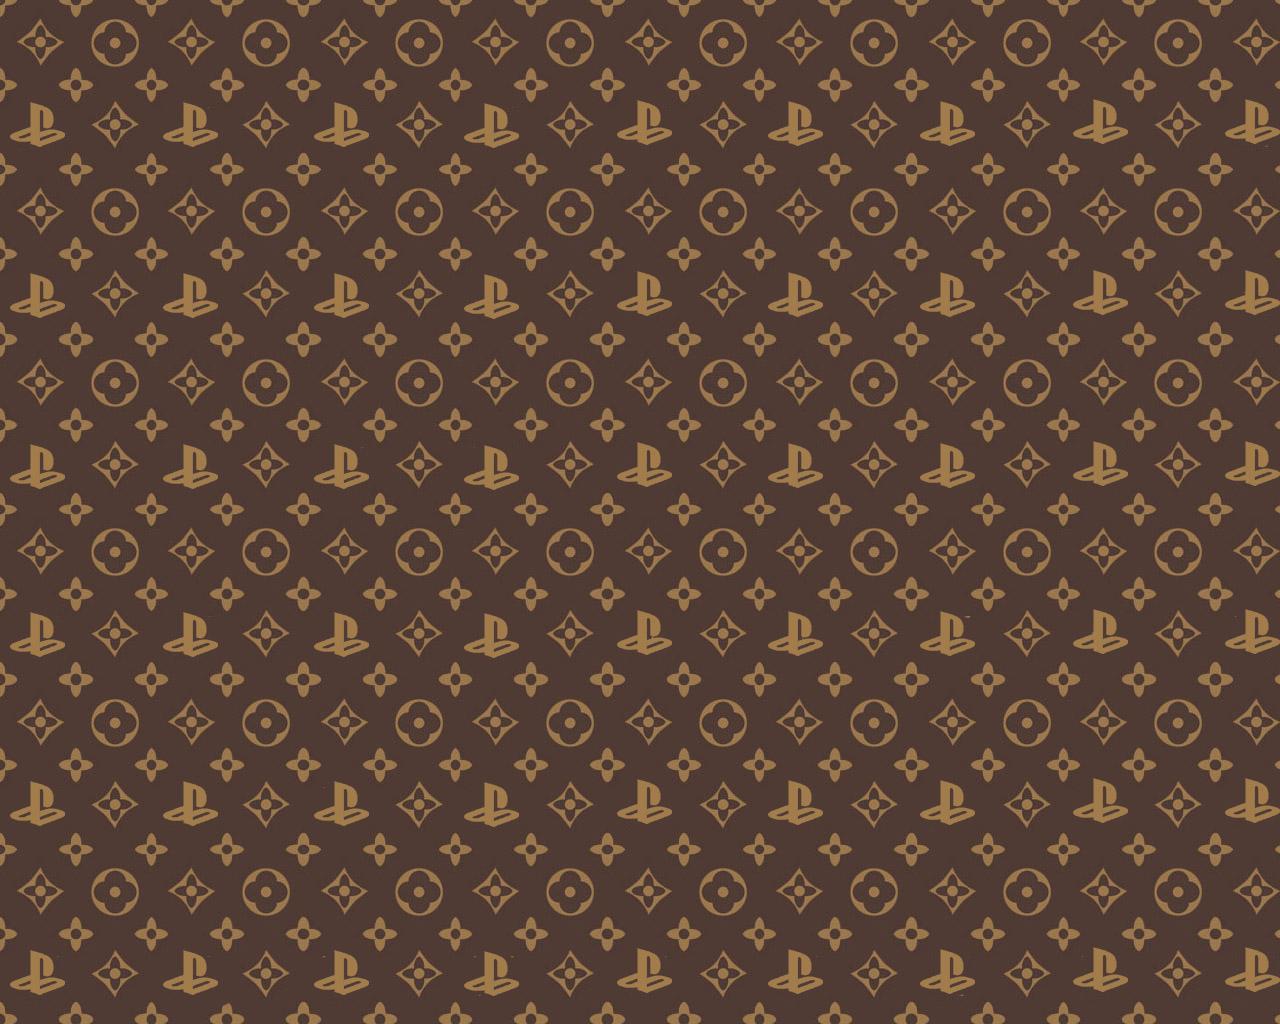 Louis Vuitton Wallpaper Iphone Xs Max